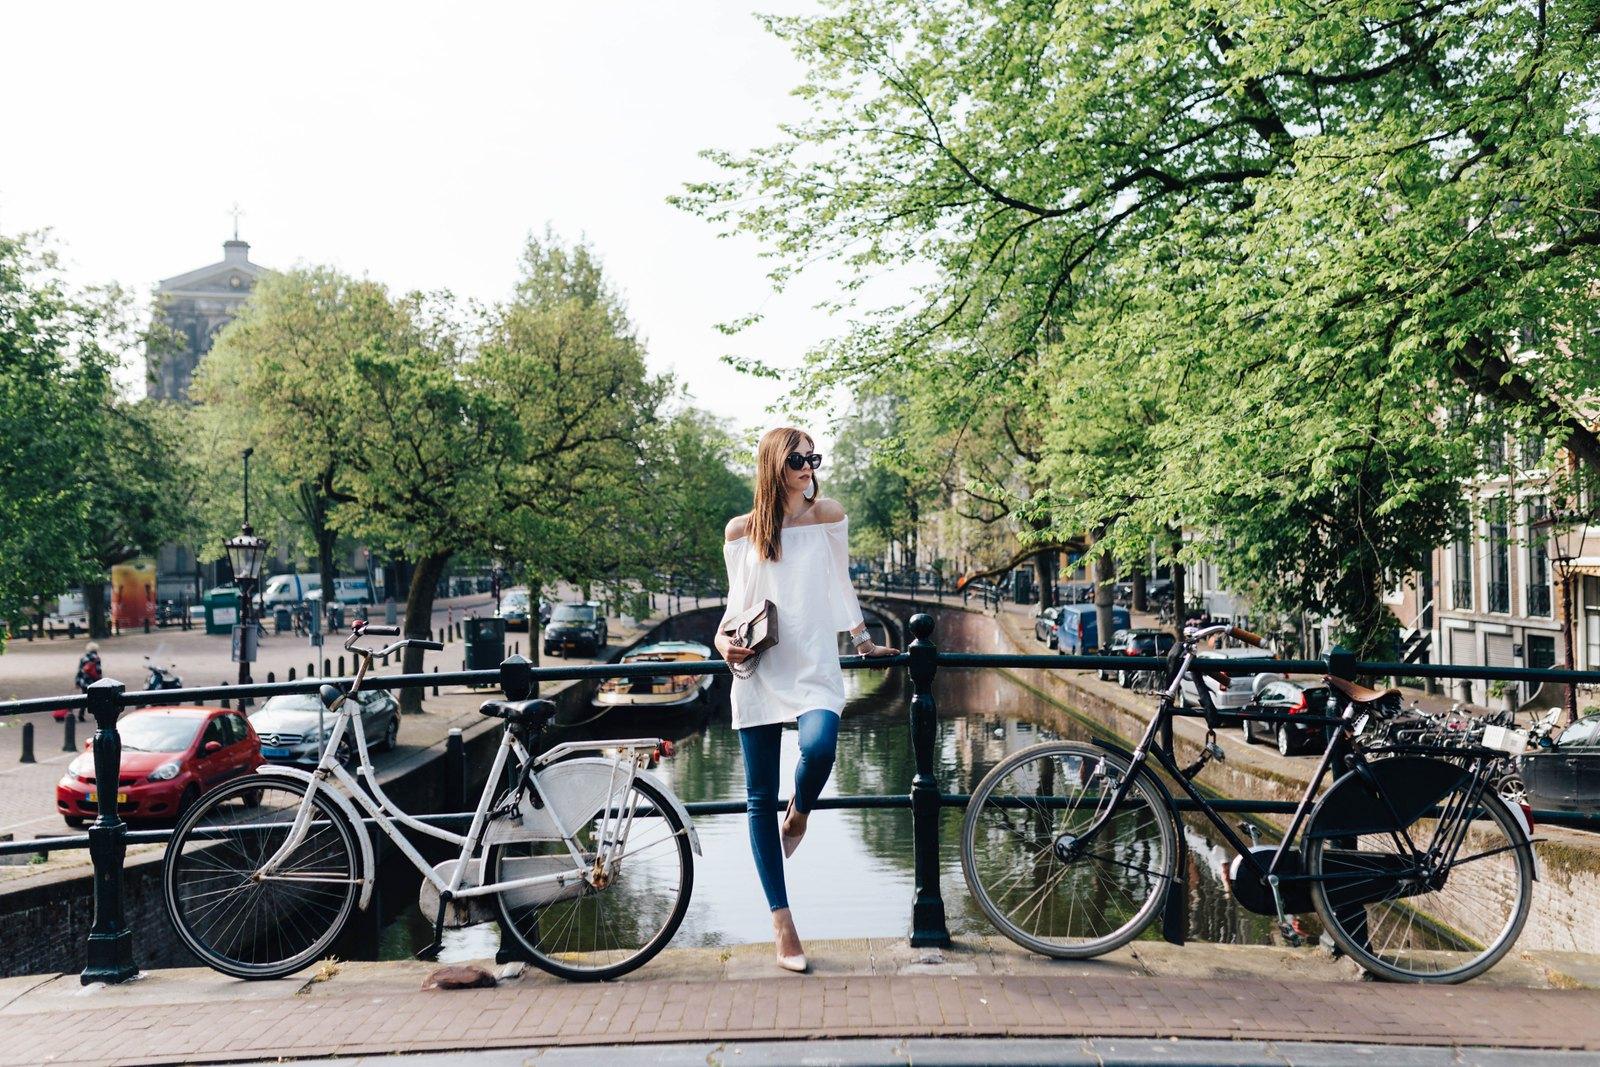 amsterdamphotowalk-117